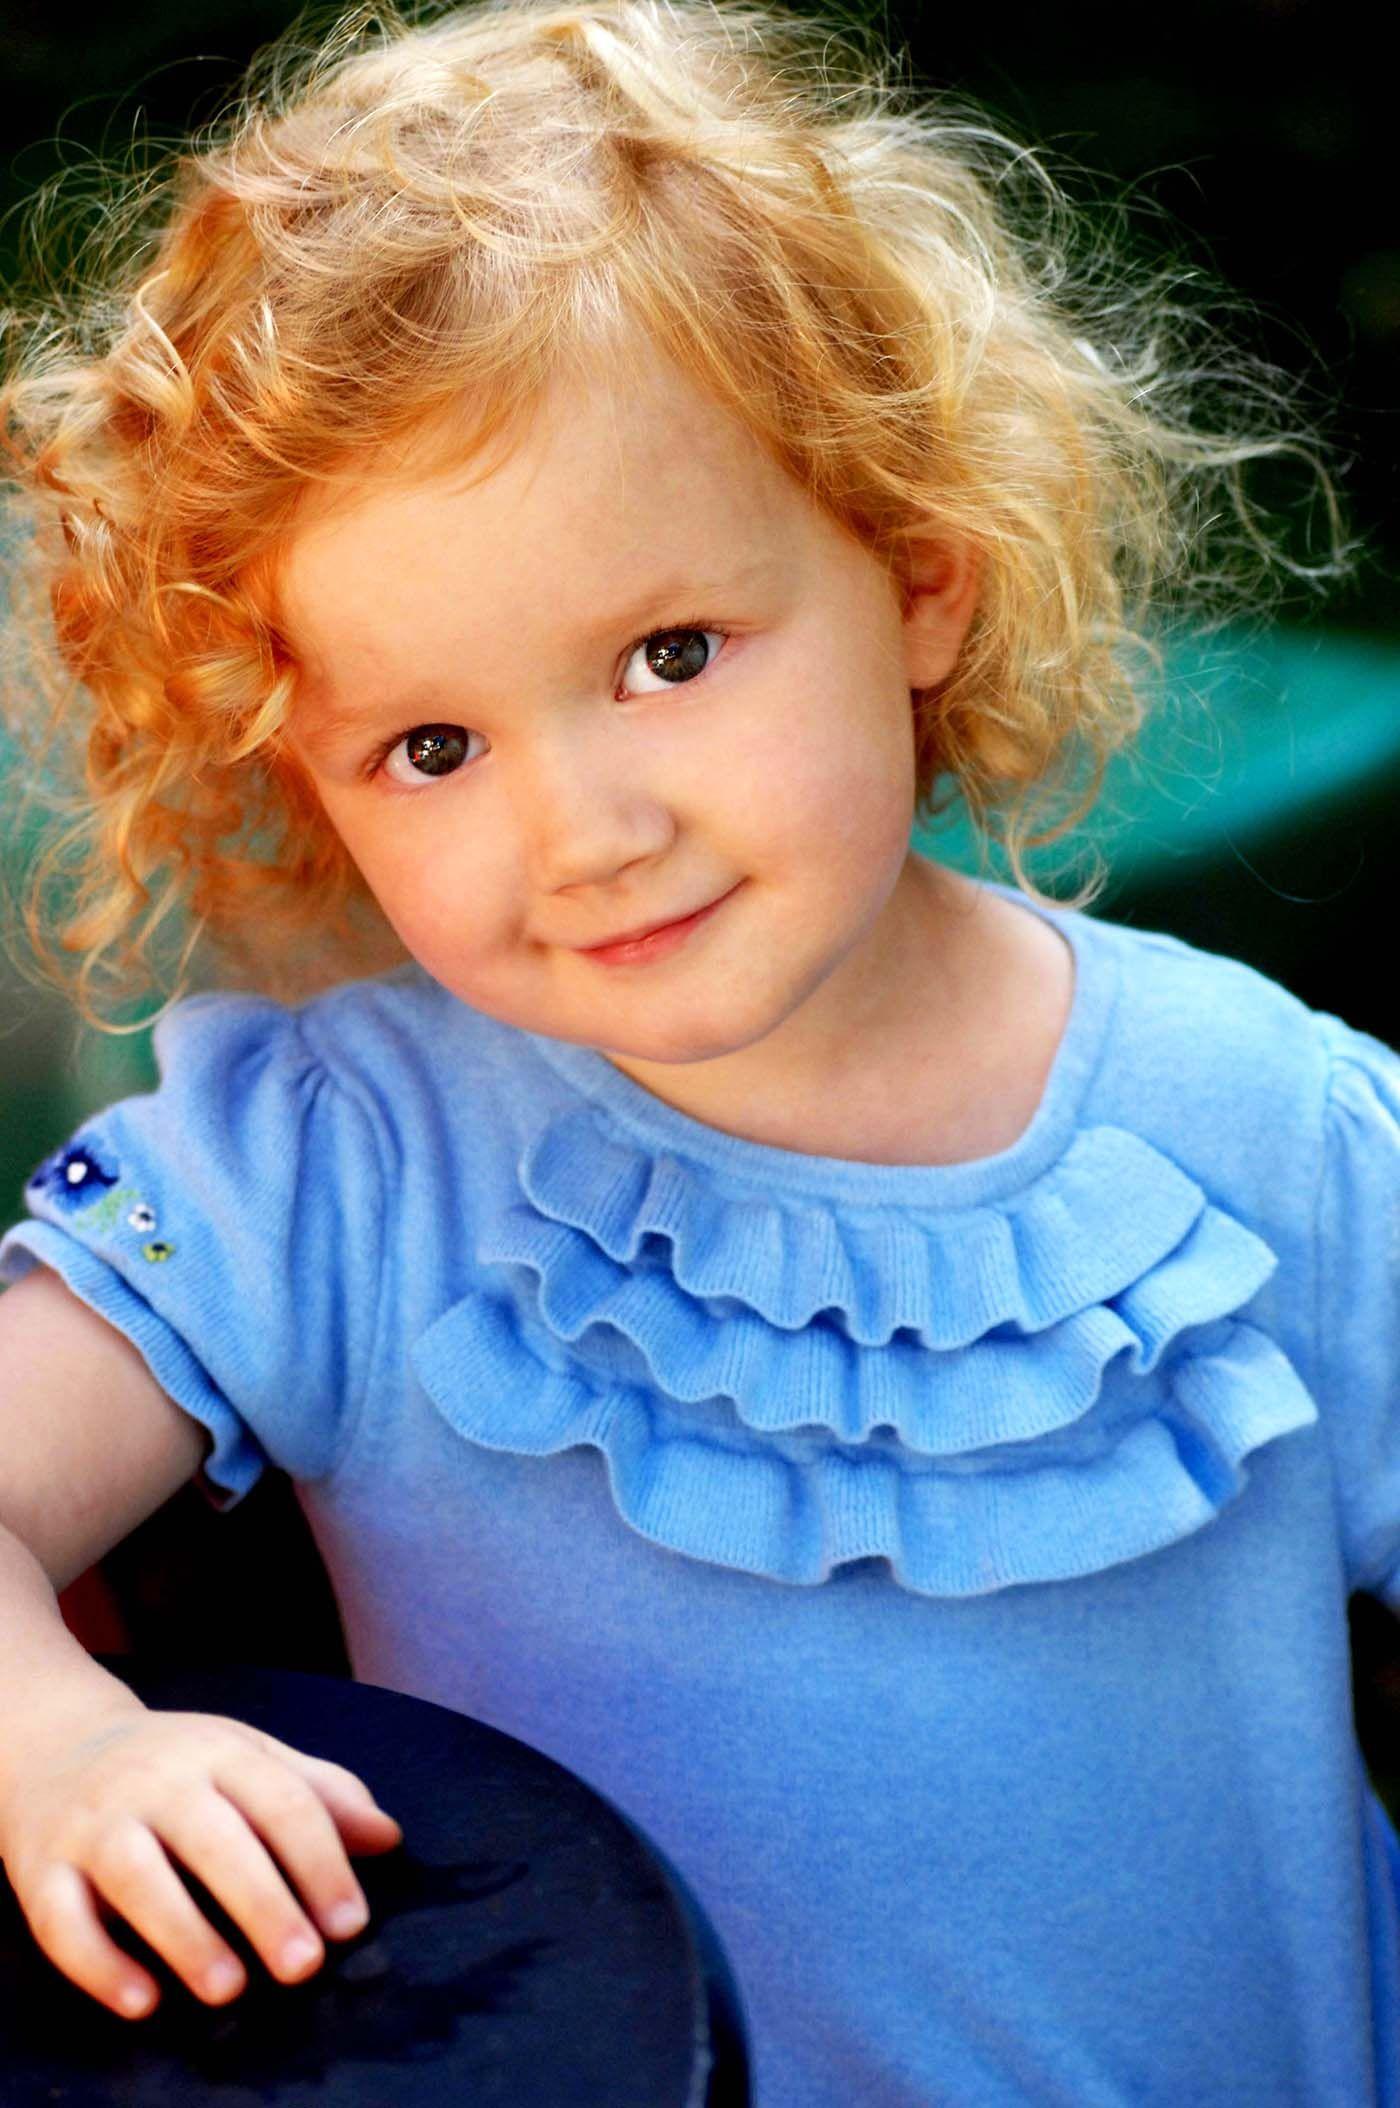 Kids Headshot In Natural Light Soft Backlighting Www